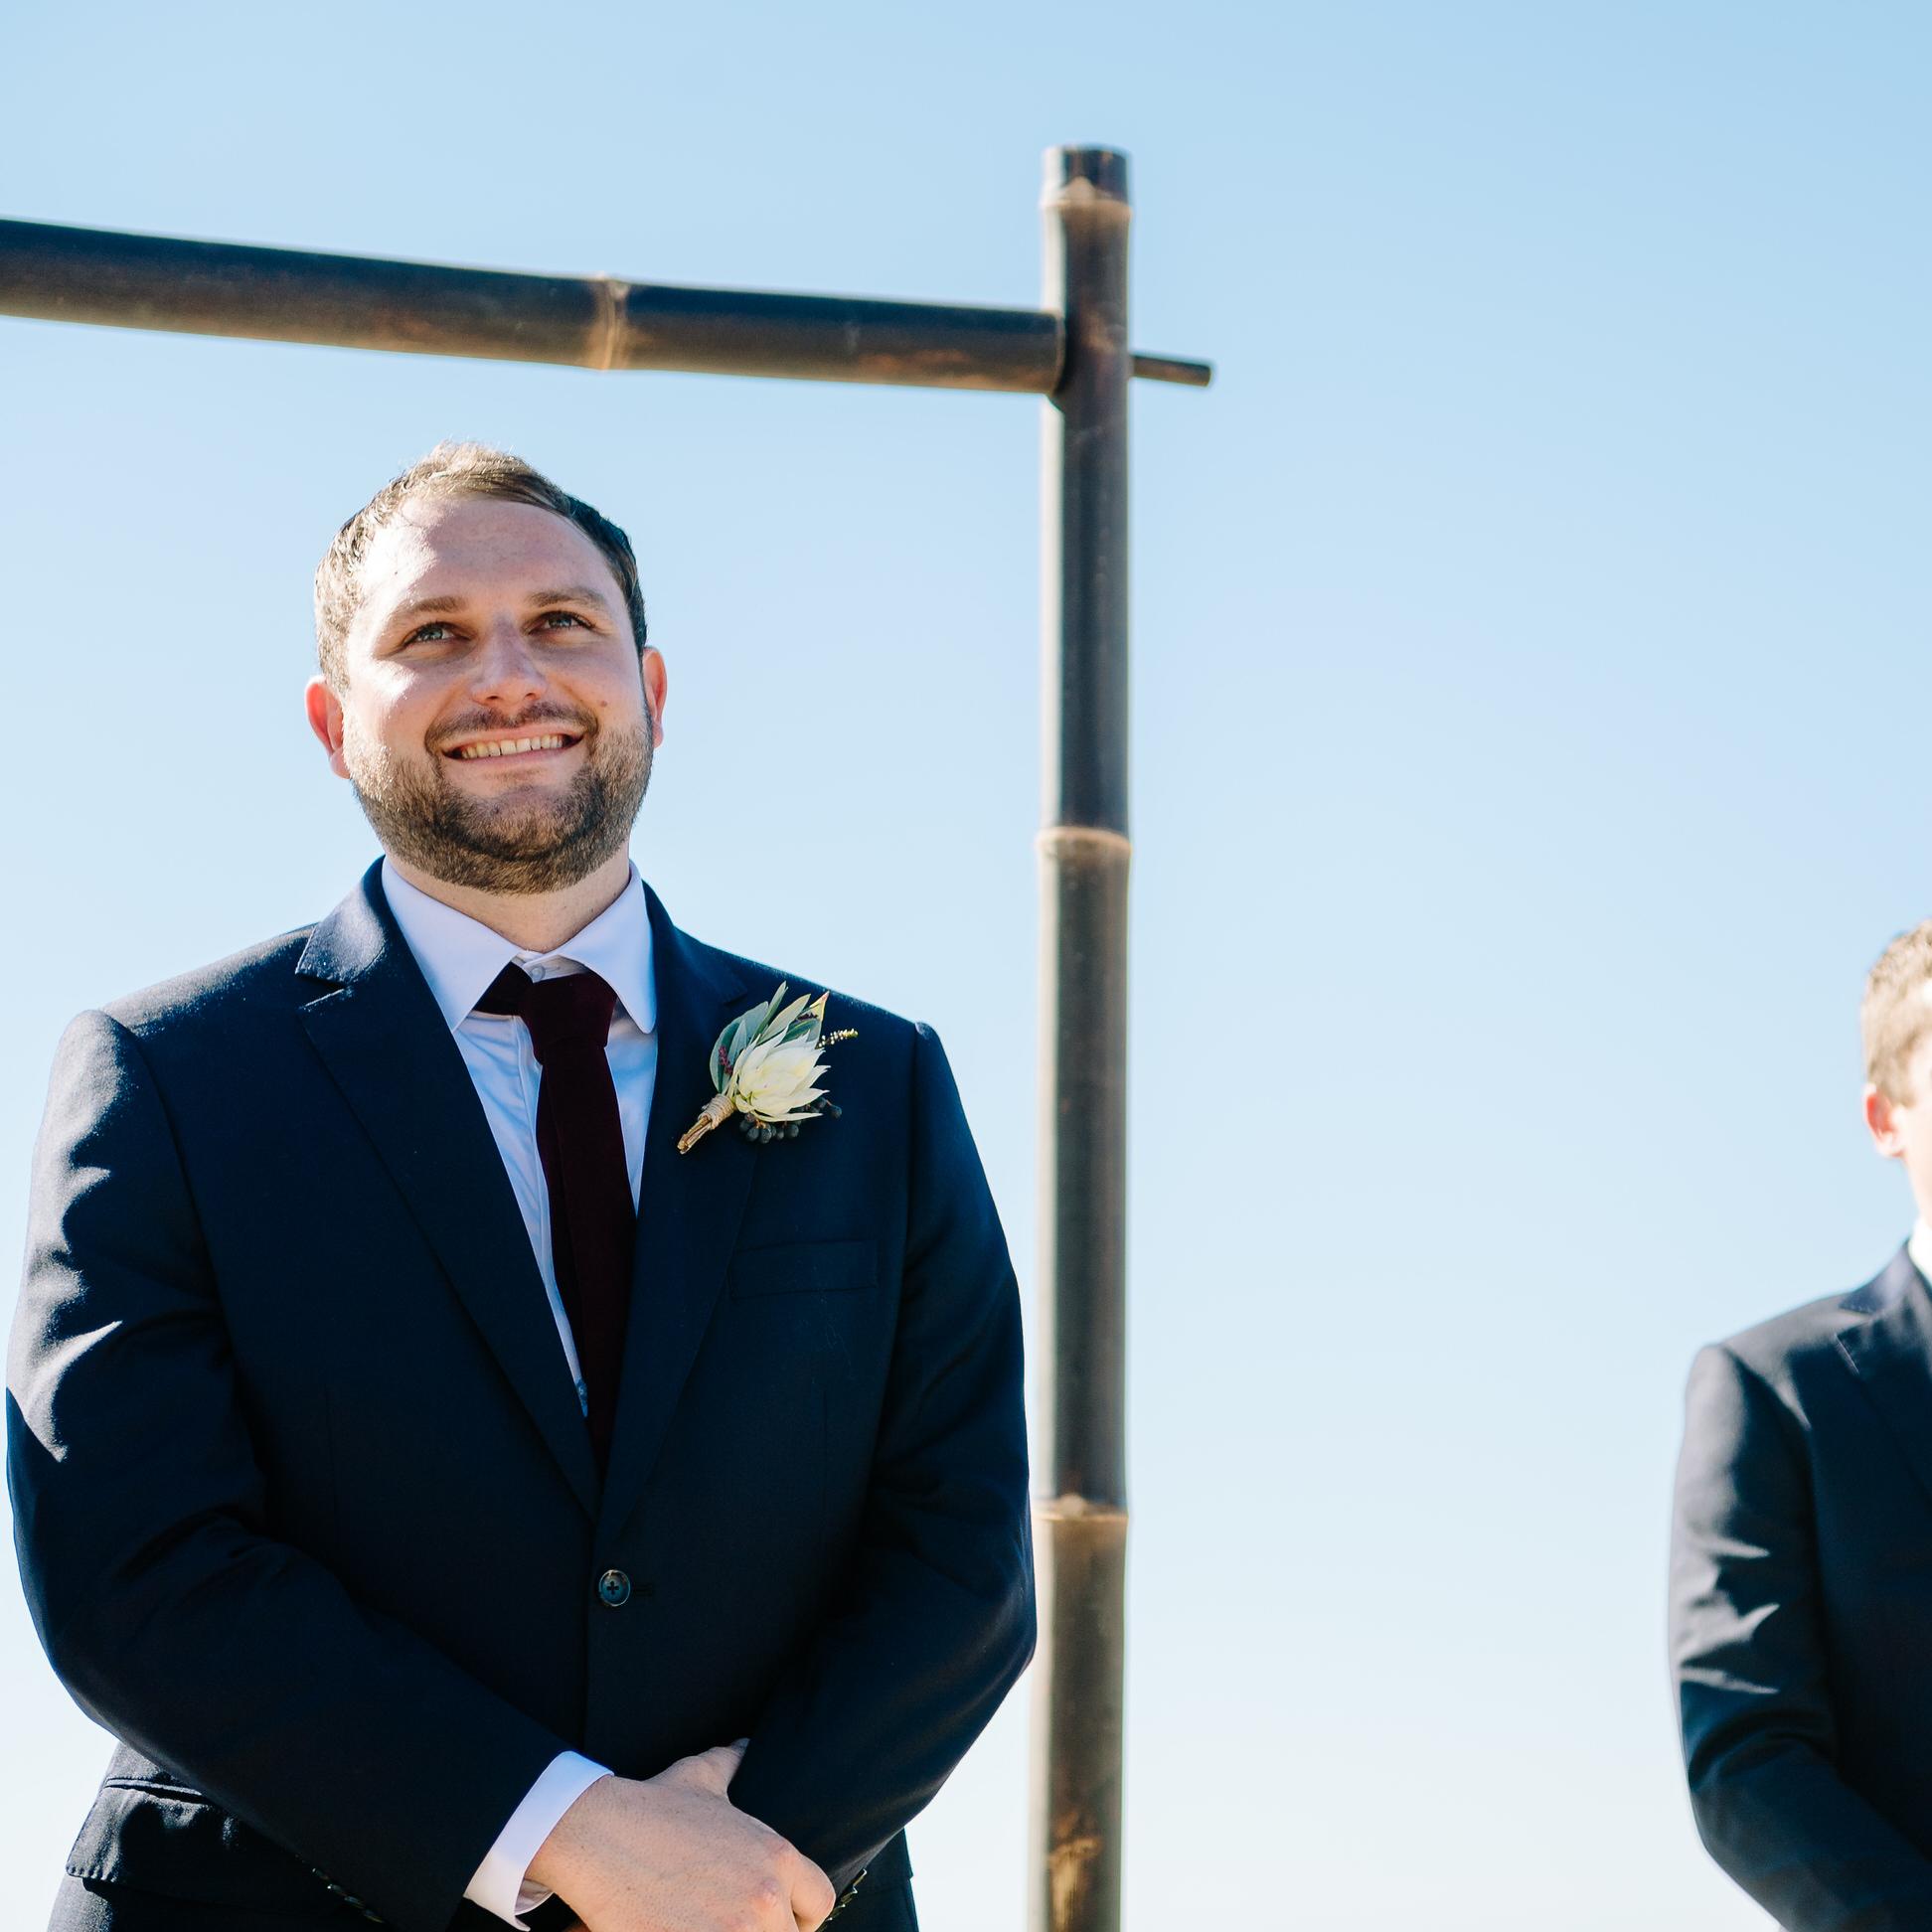 Justin_And_Jim_Photography_Byron_Bay_Wedding038.JPG